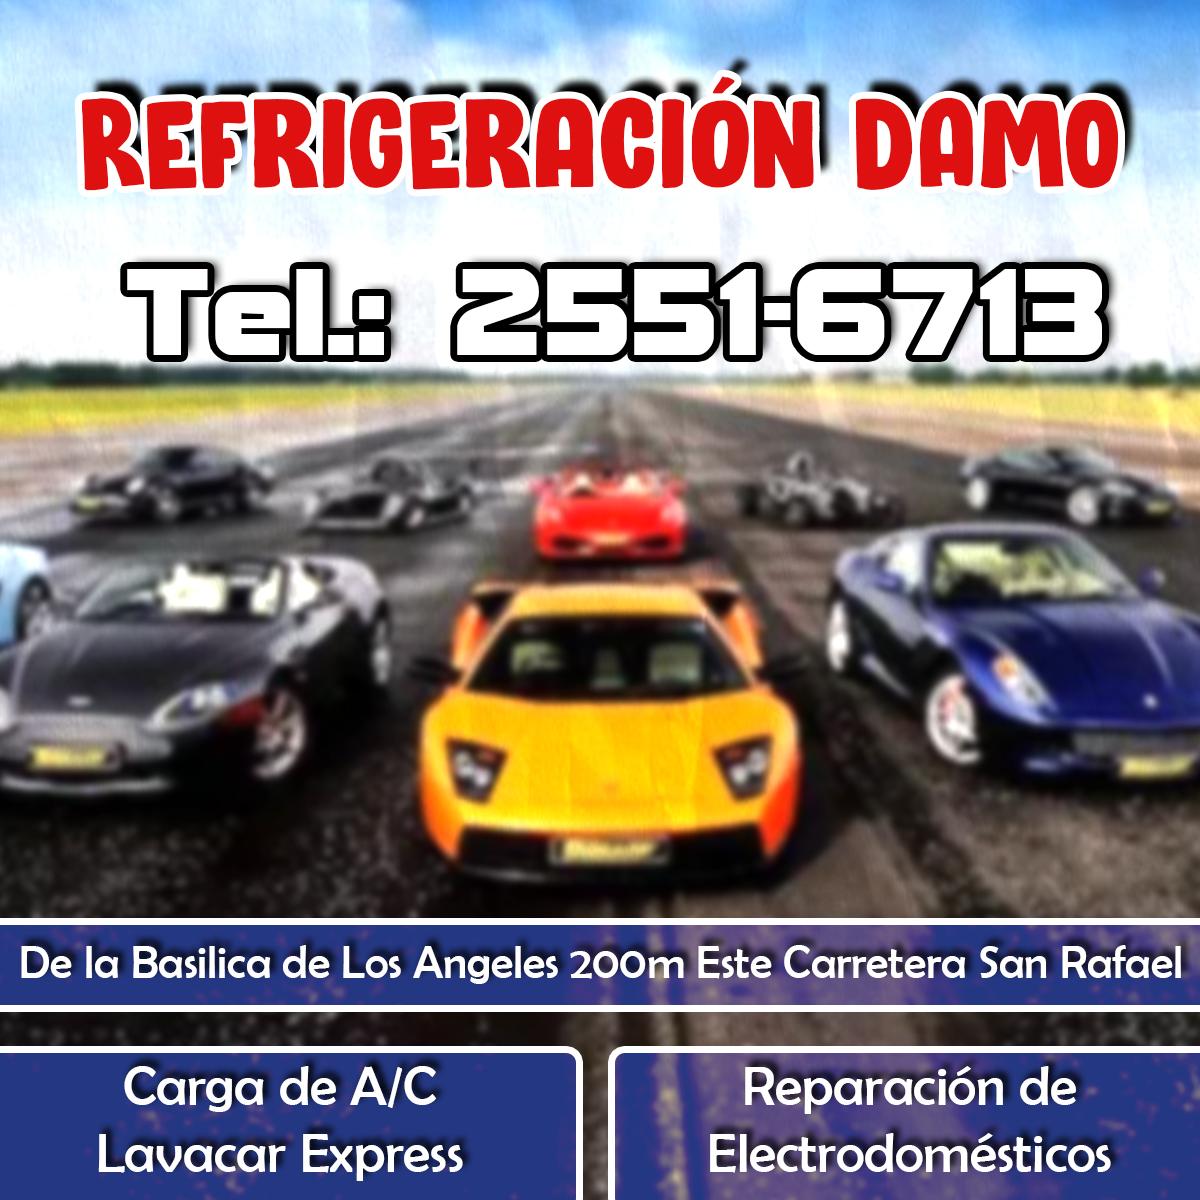 Refrigeración Damo 2551-6713